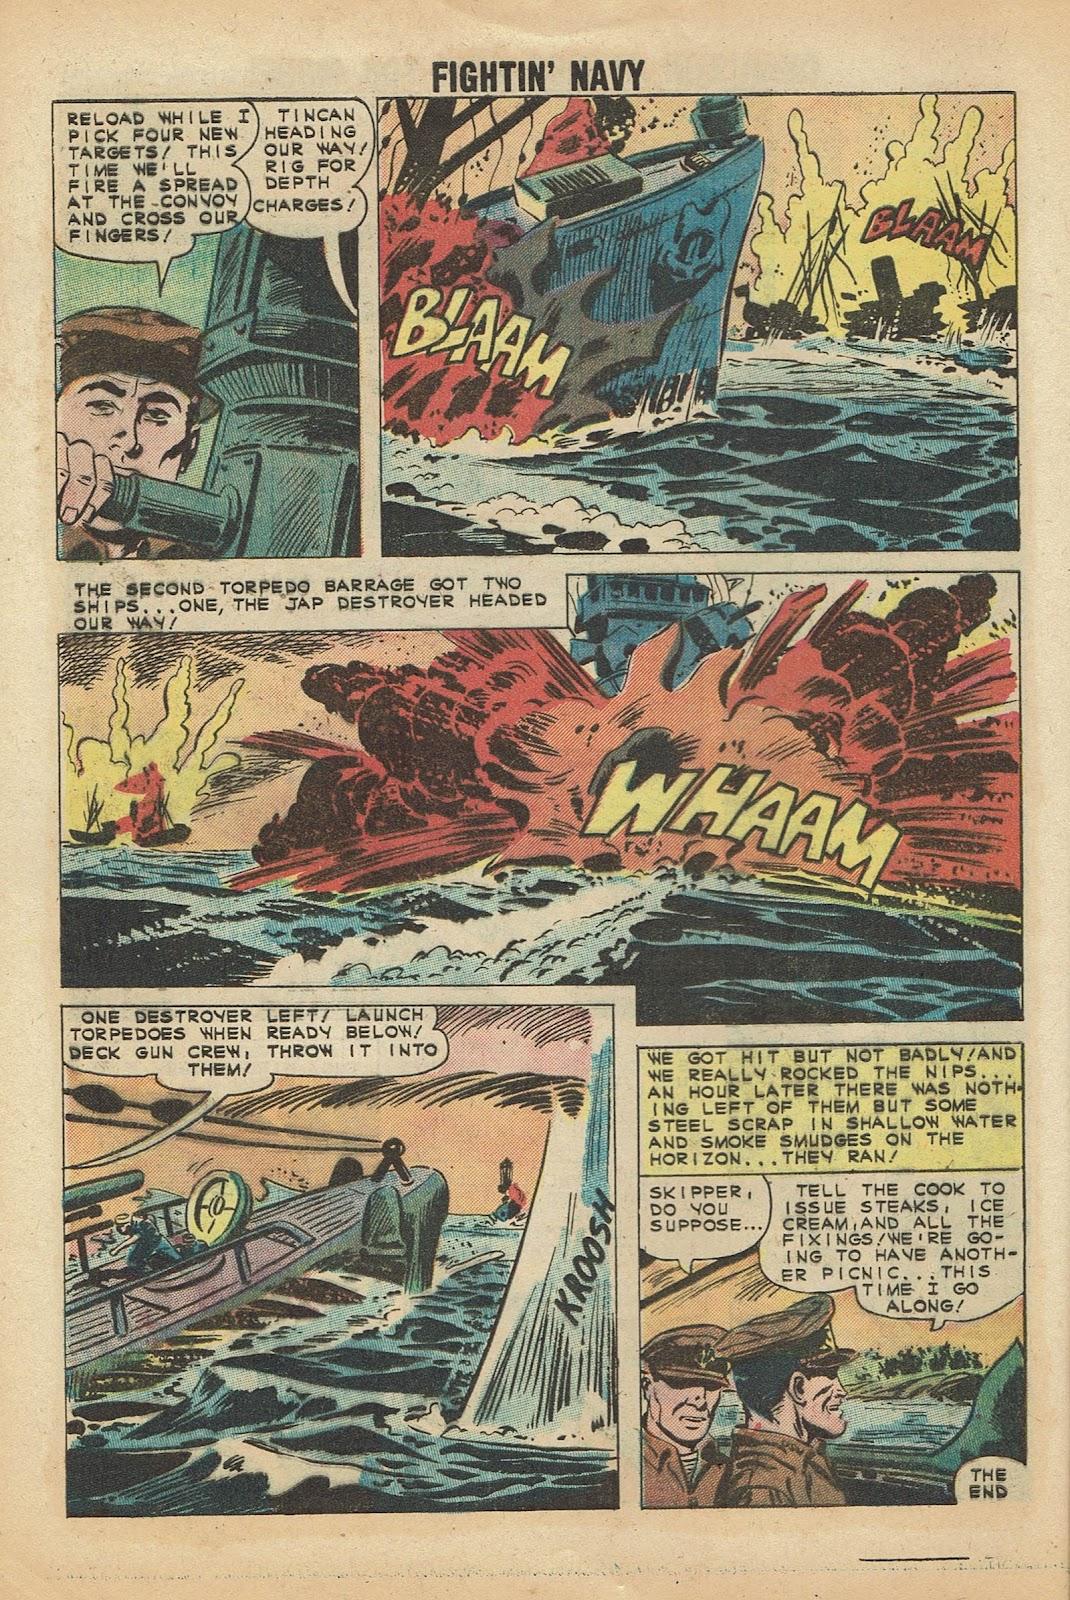 Read online Fightin' Navy comic -  Issue #97 - 8